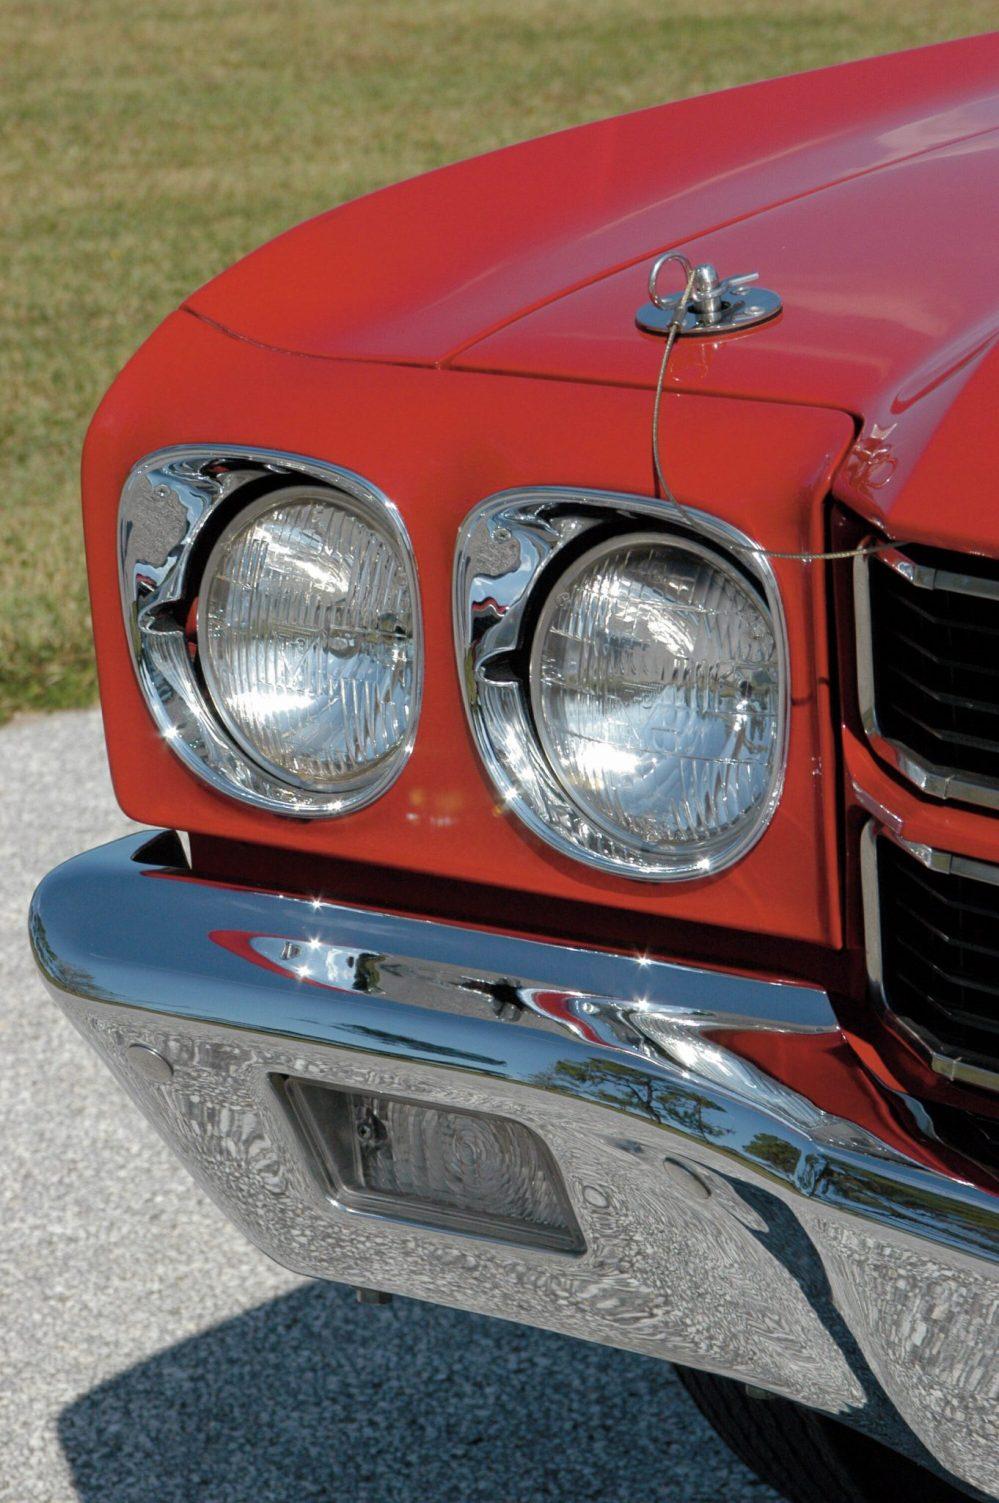 medium resolution of 1970 chevelle ls6 headlamp detail